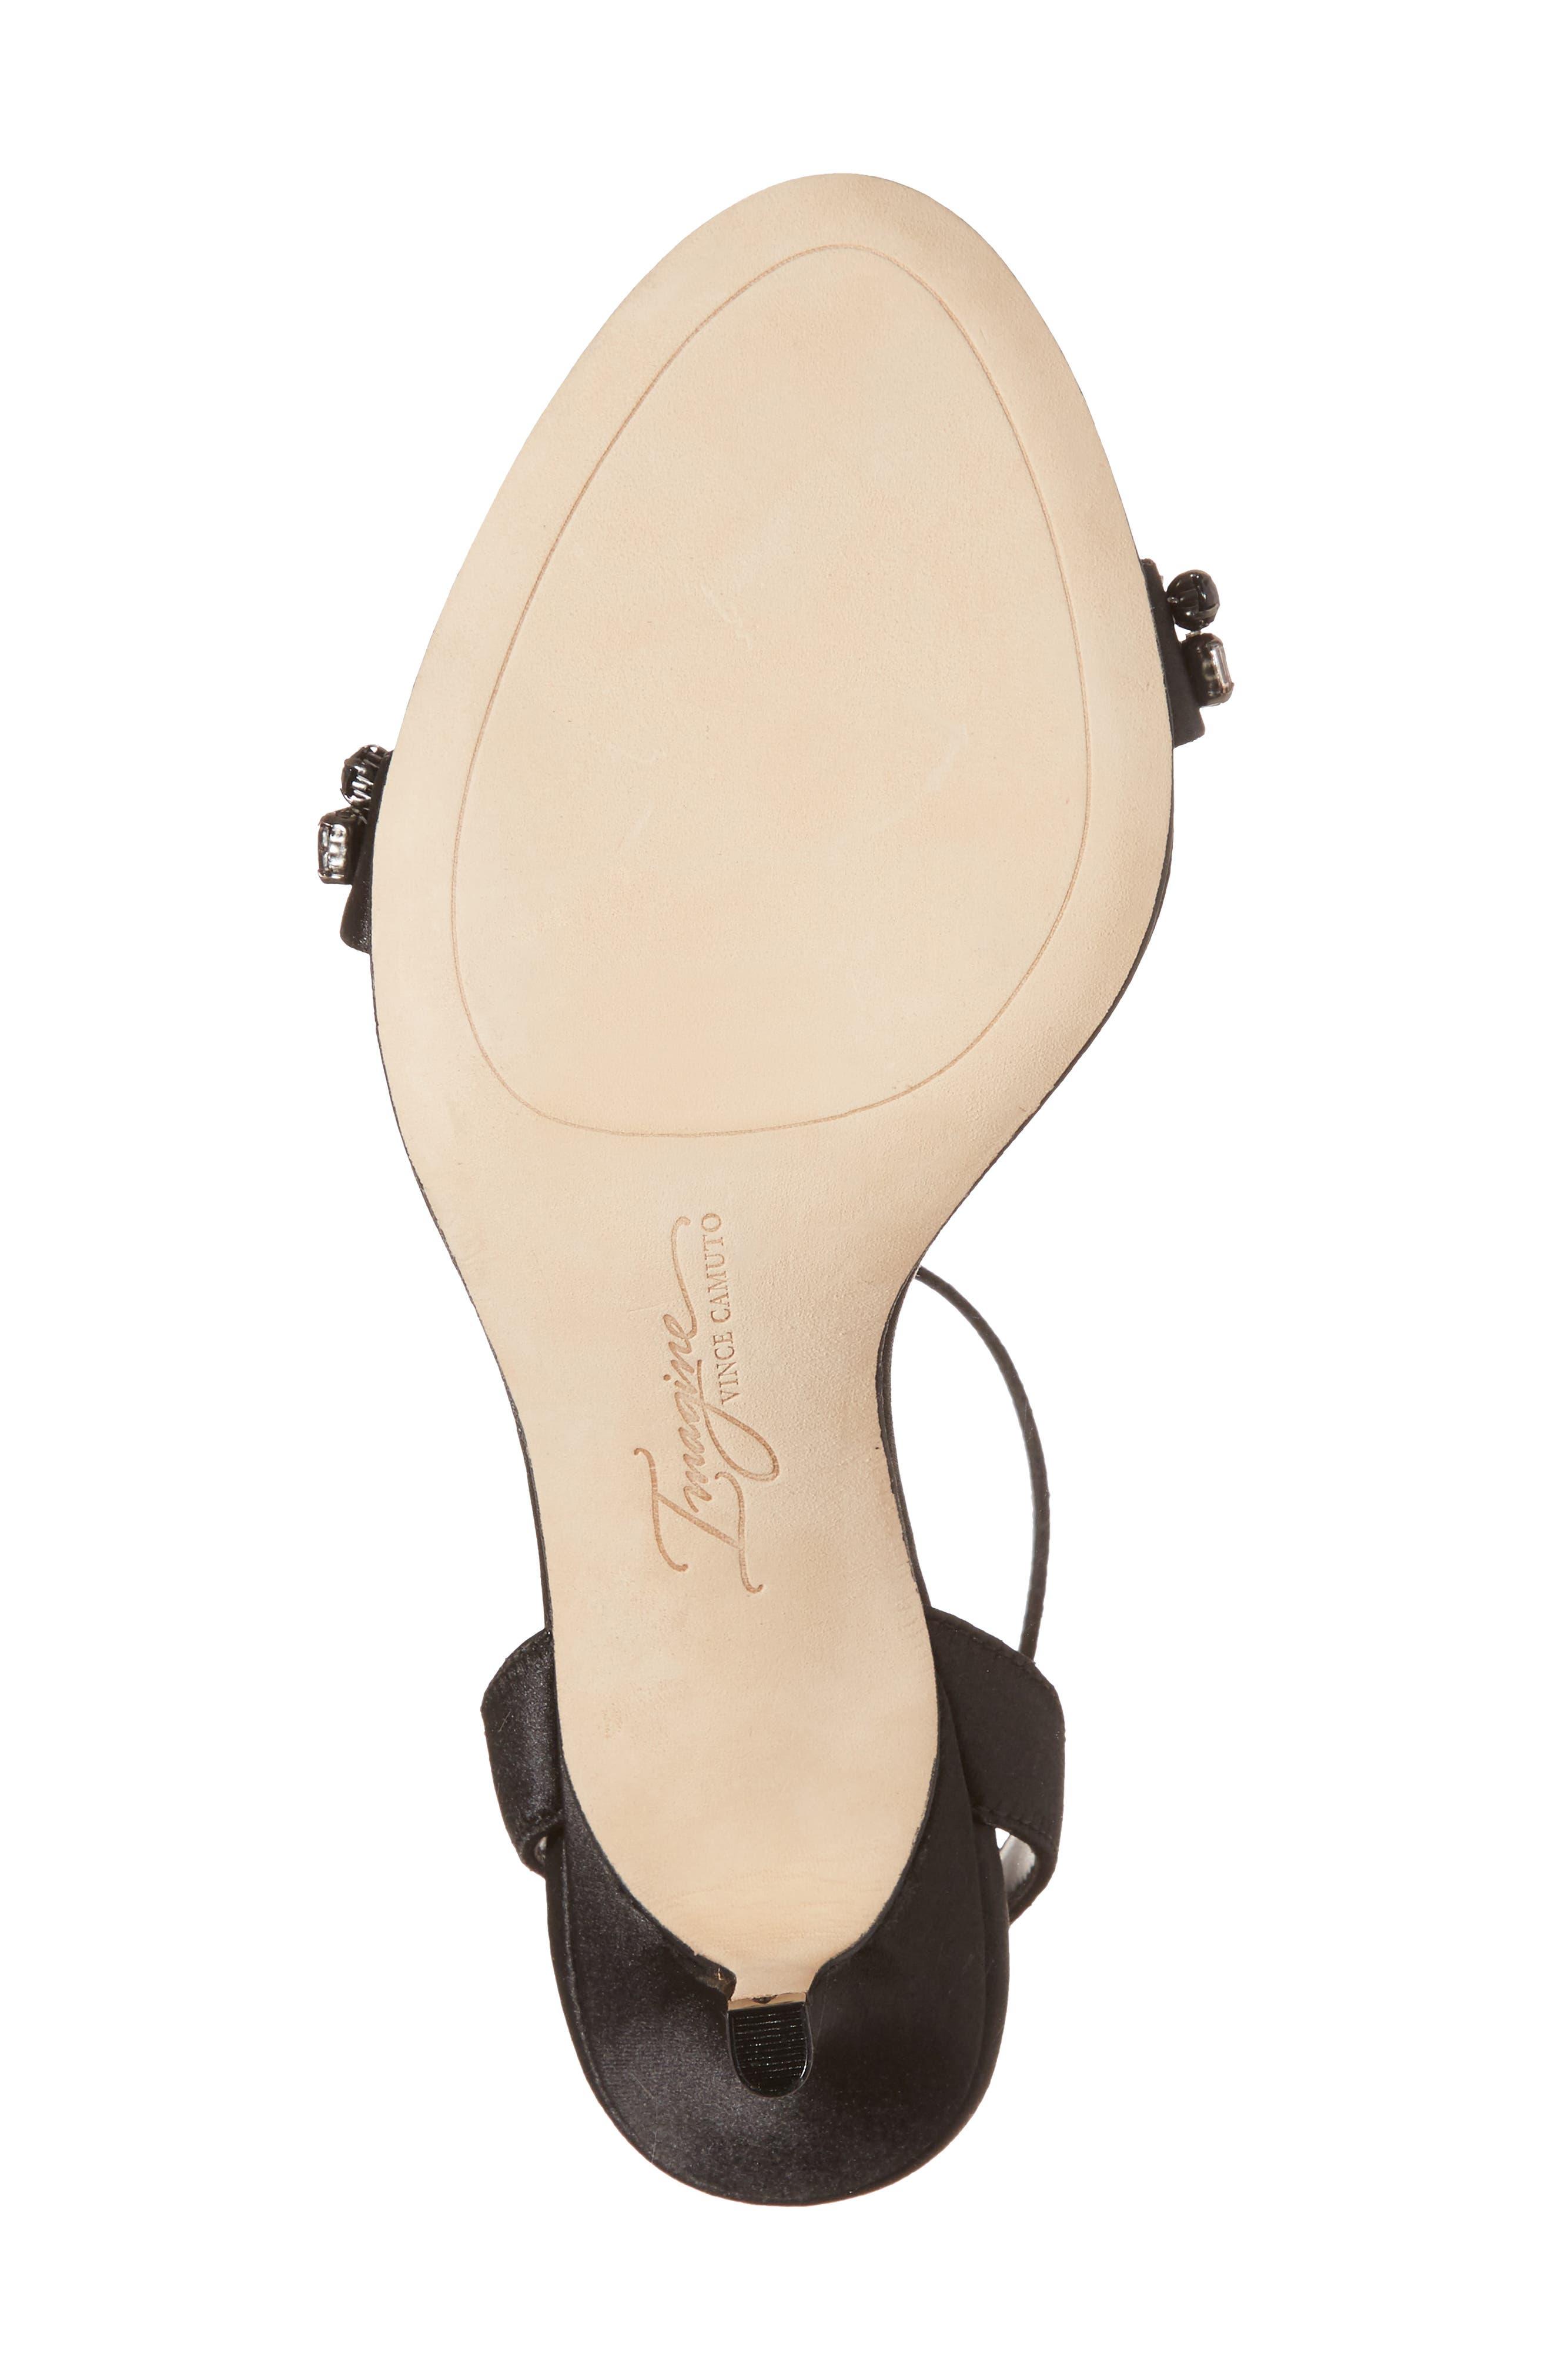 Imagine Vince Camuto Kolo Embellished Kitten Heel Sandal,                             Alternate thumbnail 6, color,                             Black Satin